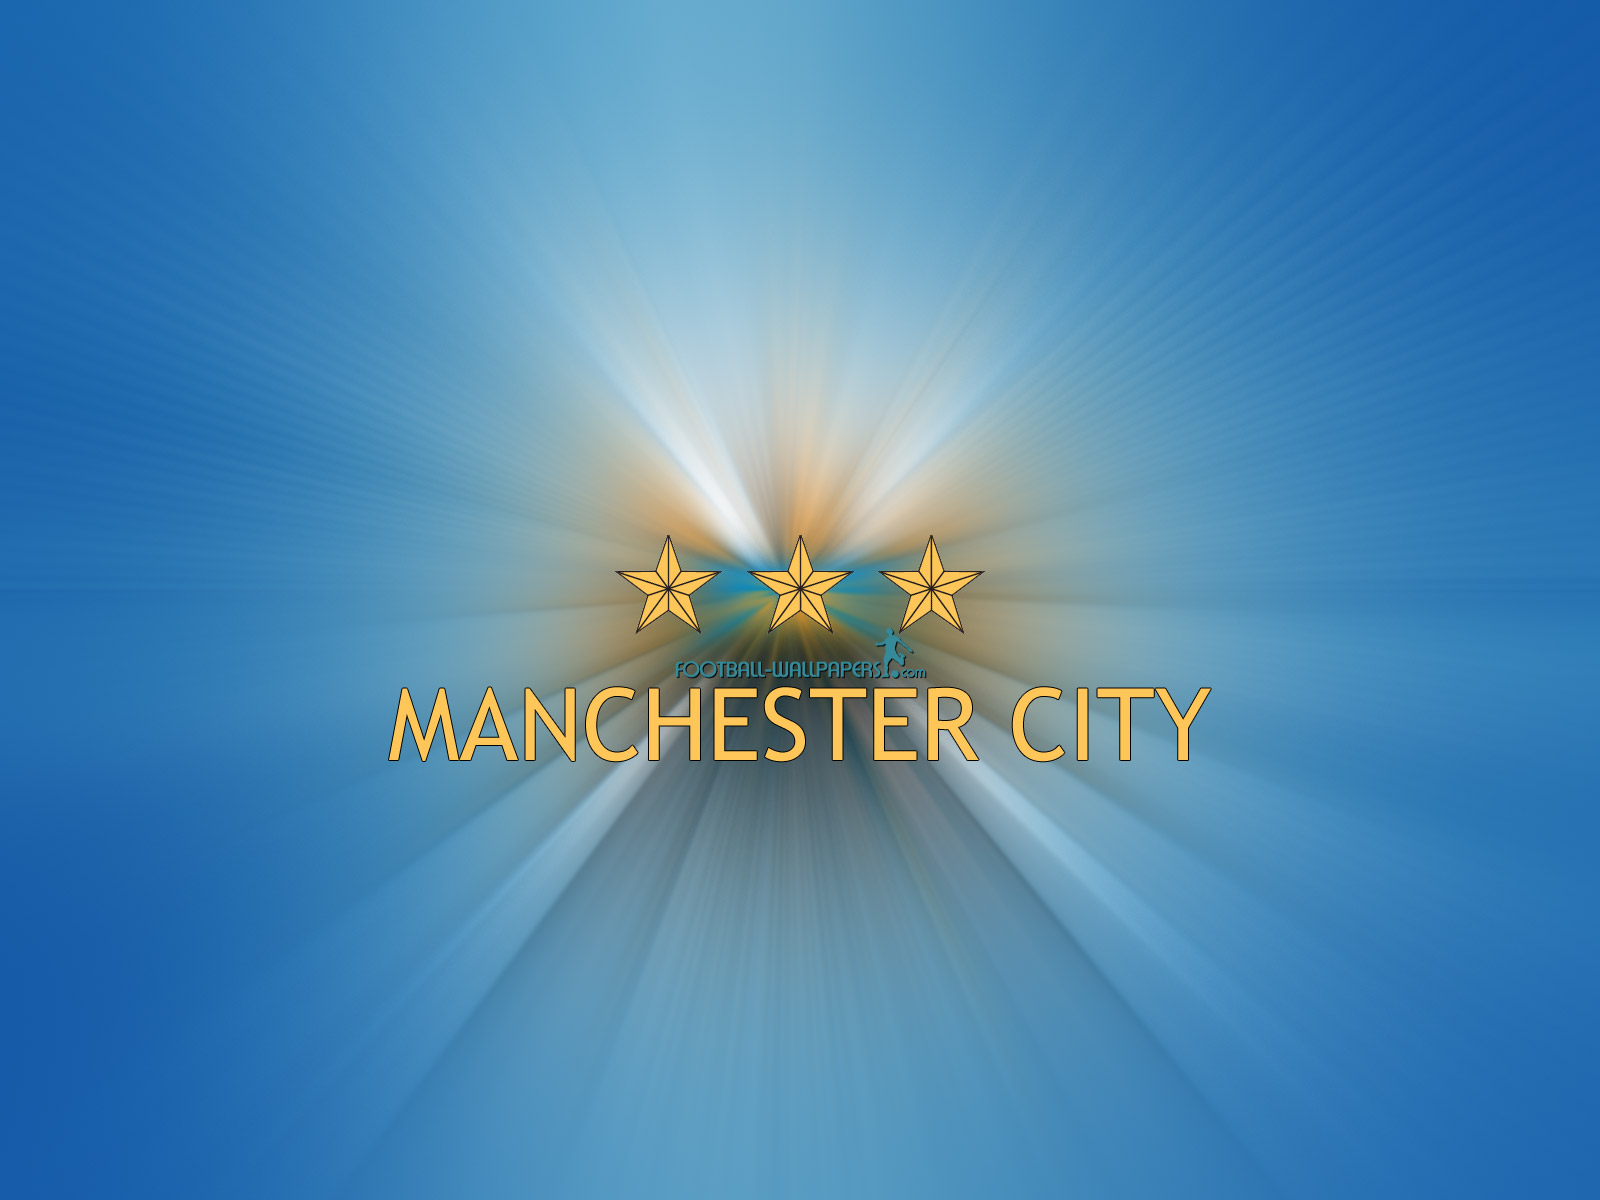 http://1.bp.blogspot.com/-cbf_X08V7Y0/ThWtMGZKcOI/AAAAAAAAAxA/fWuDWByLPYw/s1600/Manchester%2BCity%2BWallpaper%2B8.jpg